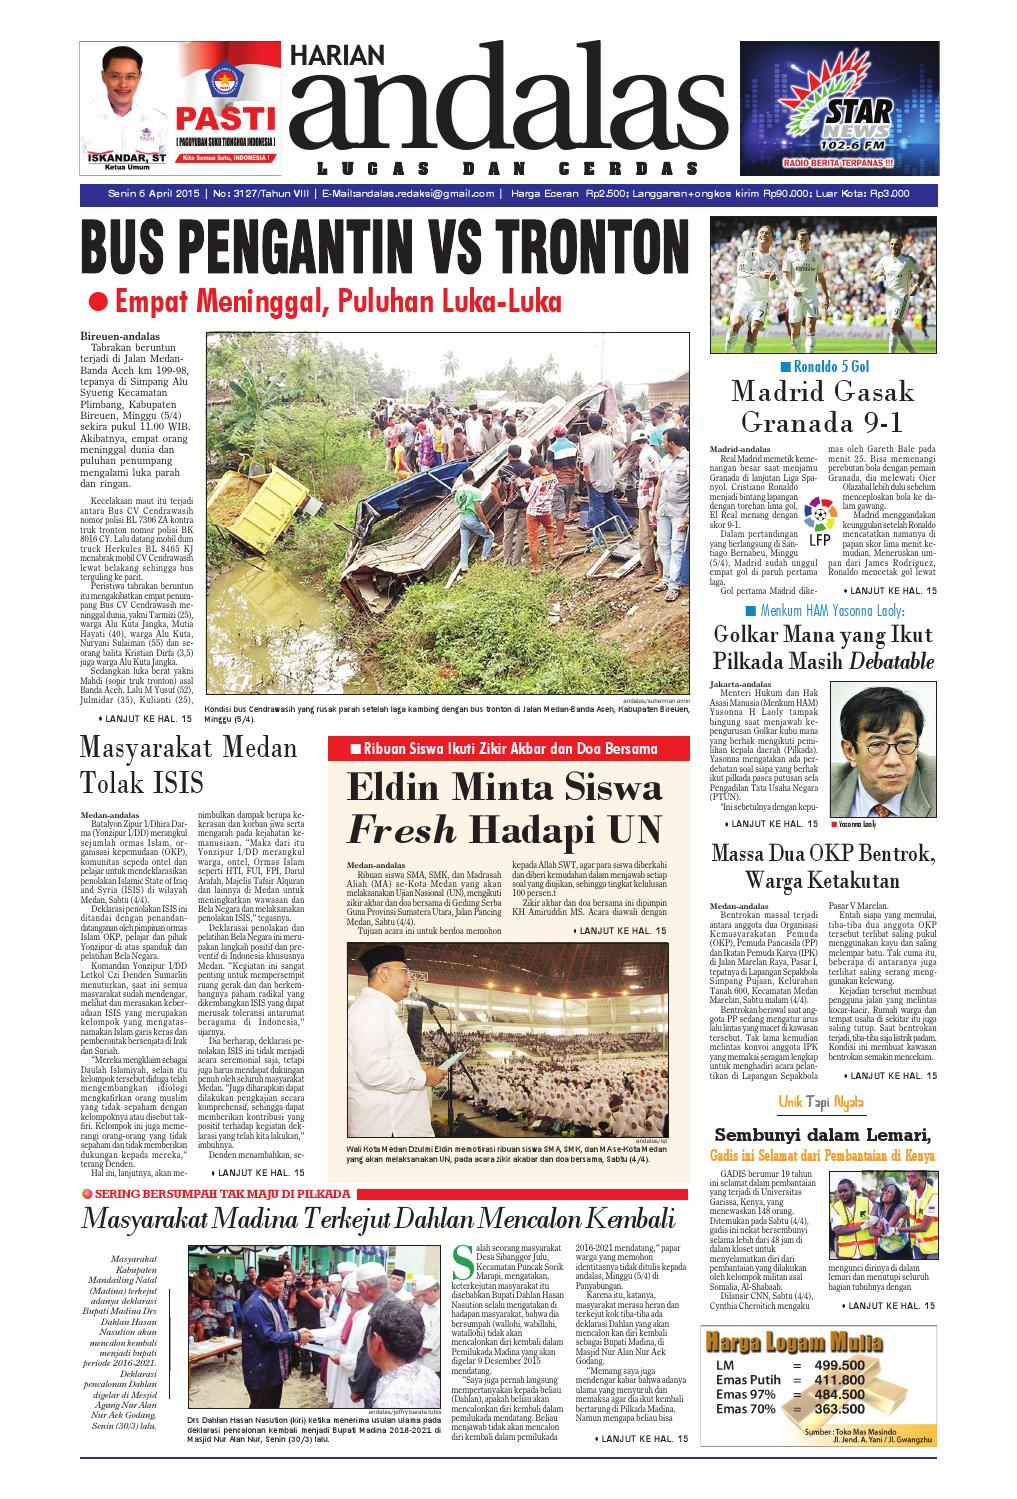 Epaper Andalas Edisi Senin 6 April 2015 By Media Issuu Fcenter Lemari Pakaian Wd Hk 1802 Sh Jawa Tengah